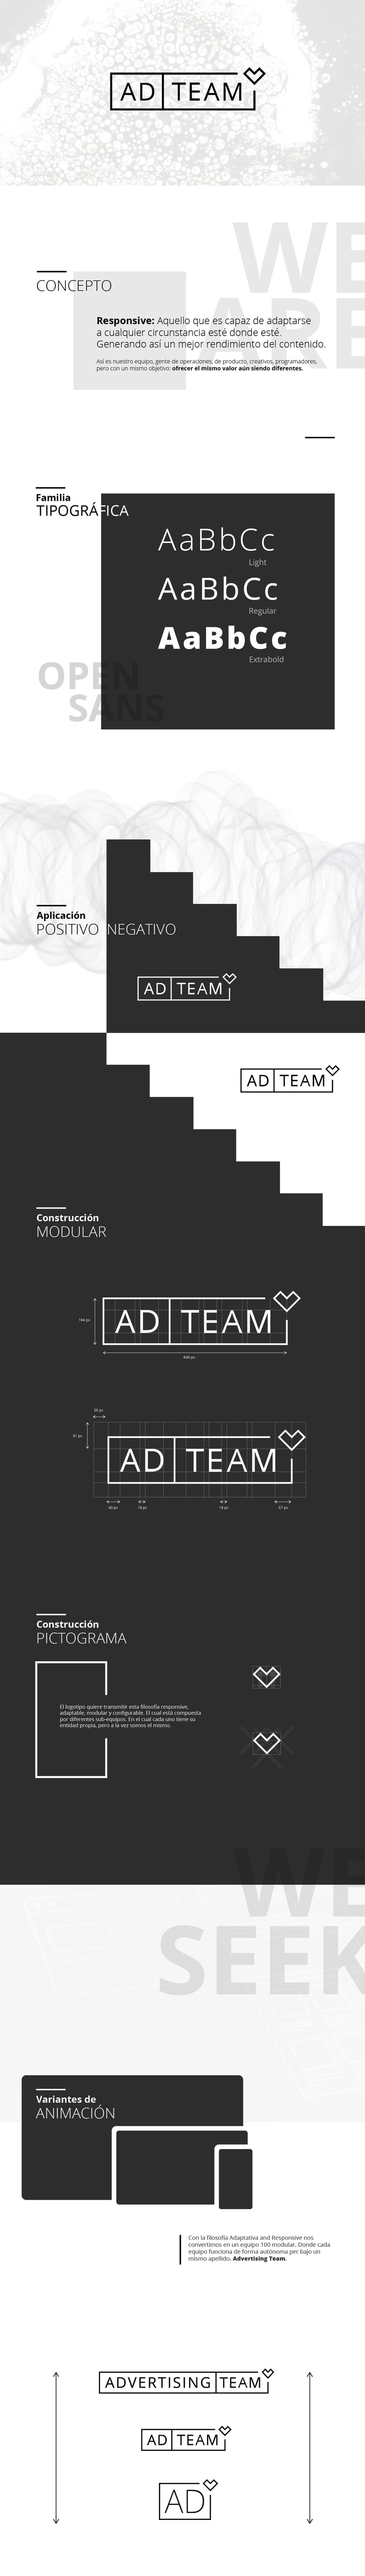 Brand Manual AD TEAM 1